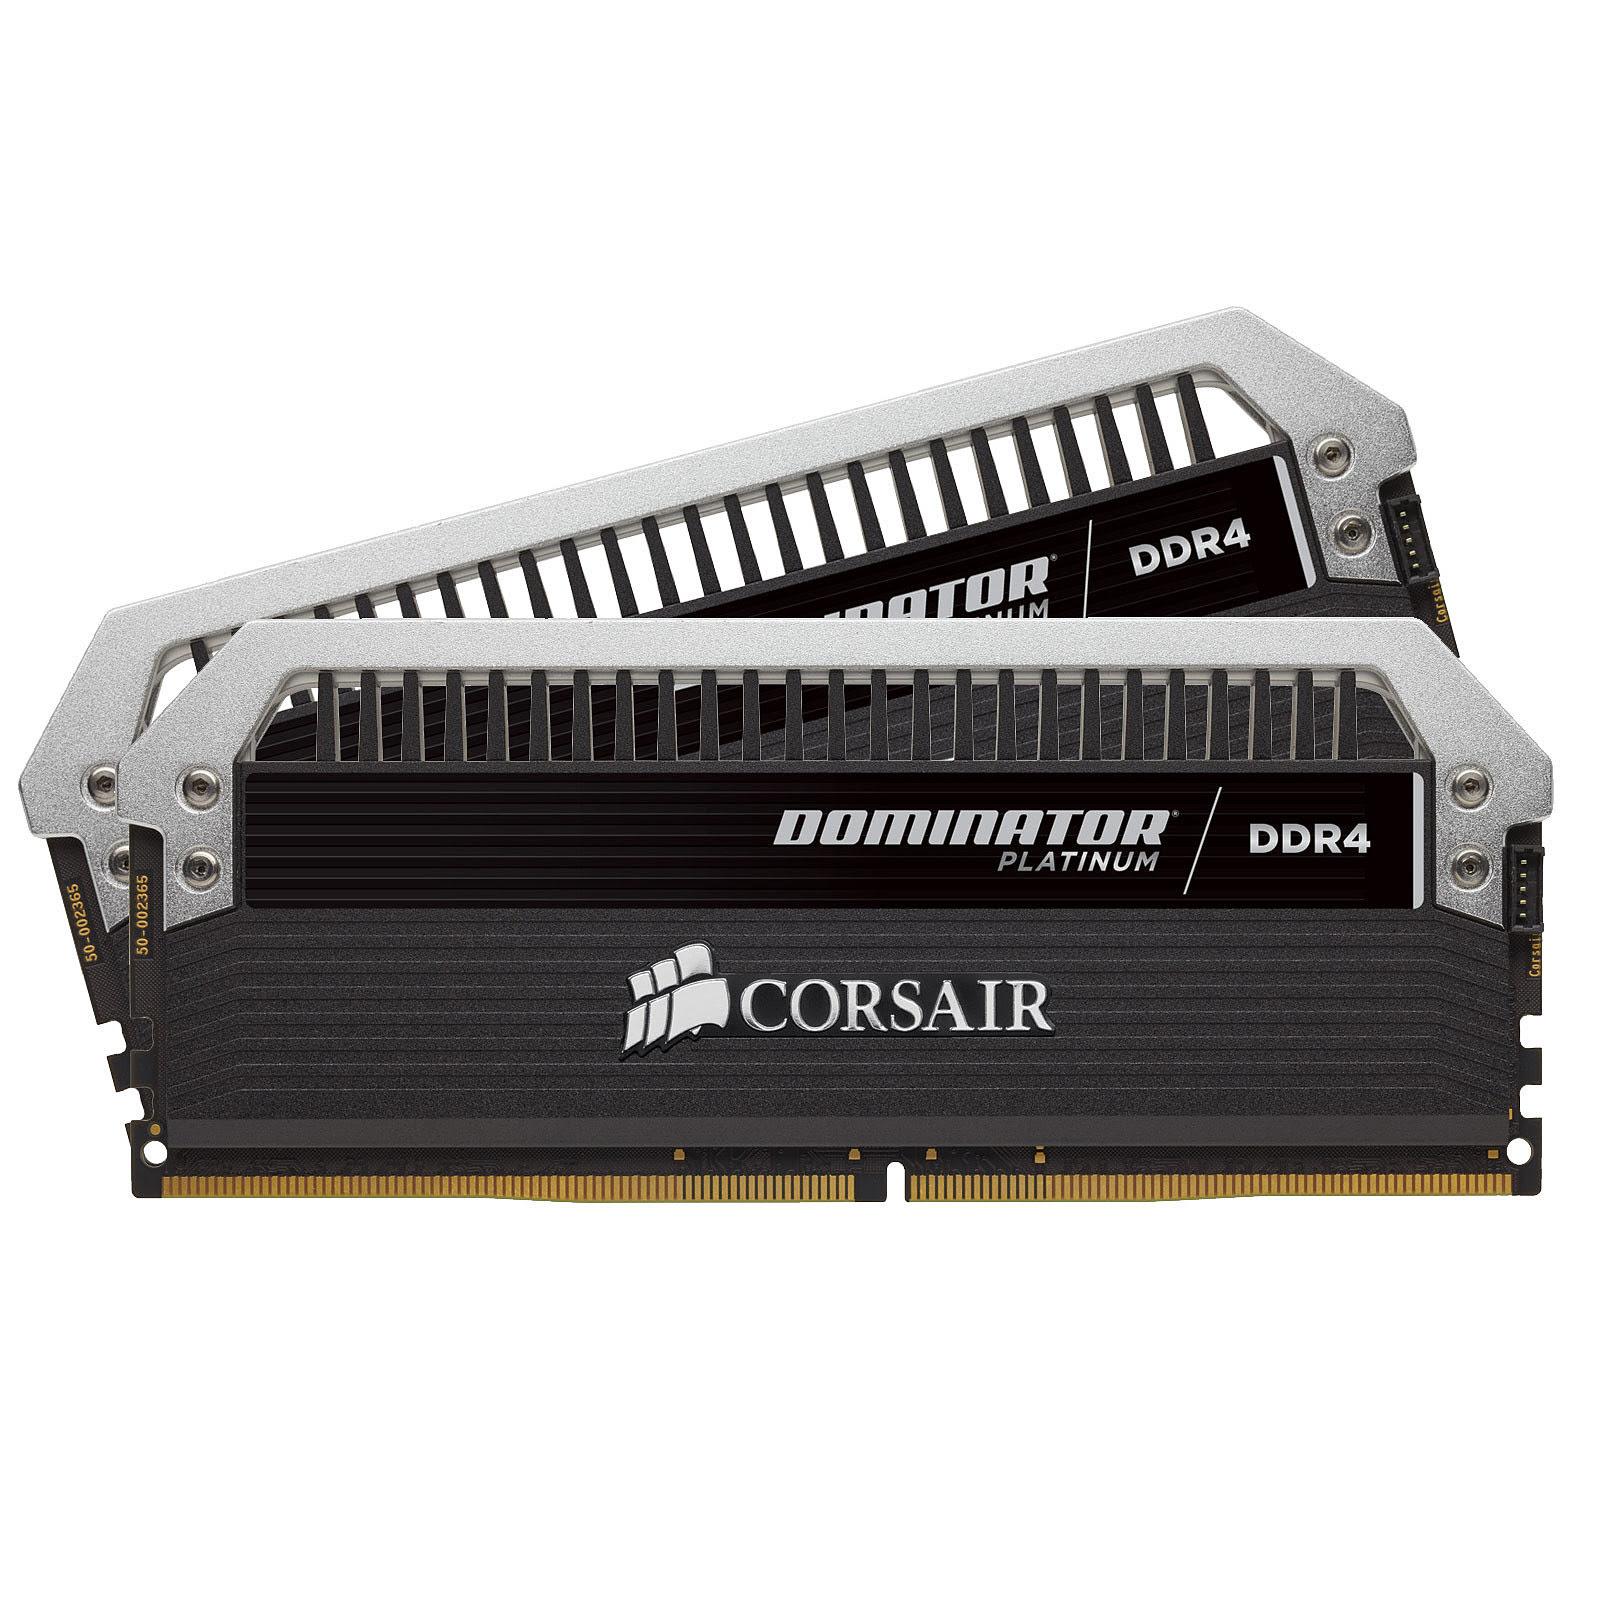 Corsair Dominator Platinium 32Go (2x16Go) DDR4 3000 MHz C15 (CMD32GX4M2B3000C15) - Achat / Vente Mémoire PC sur Cybertek.fr - 0